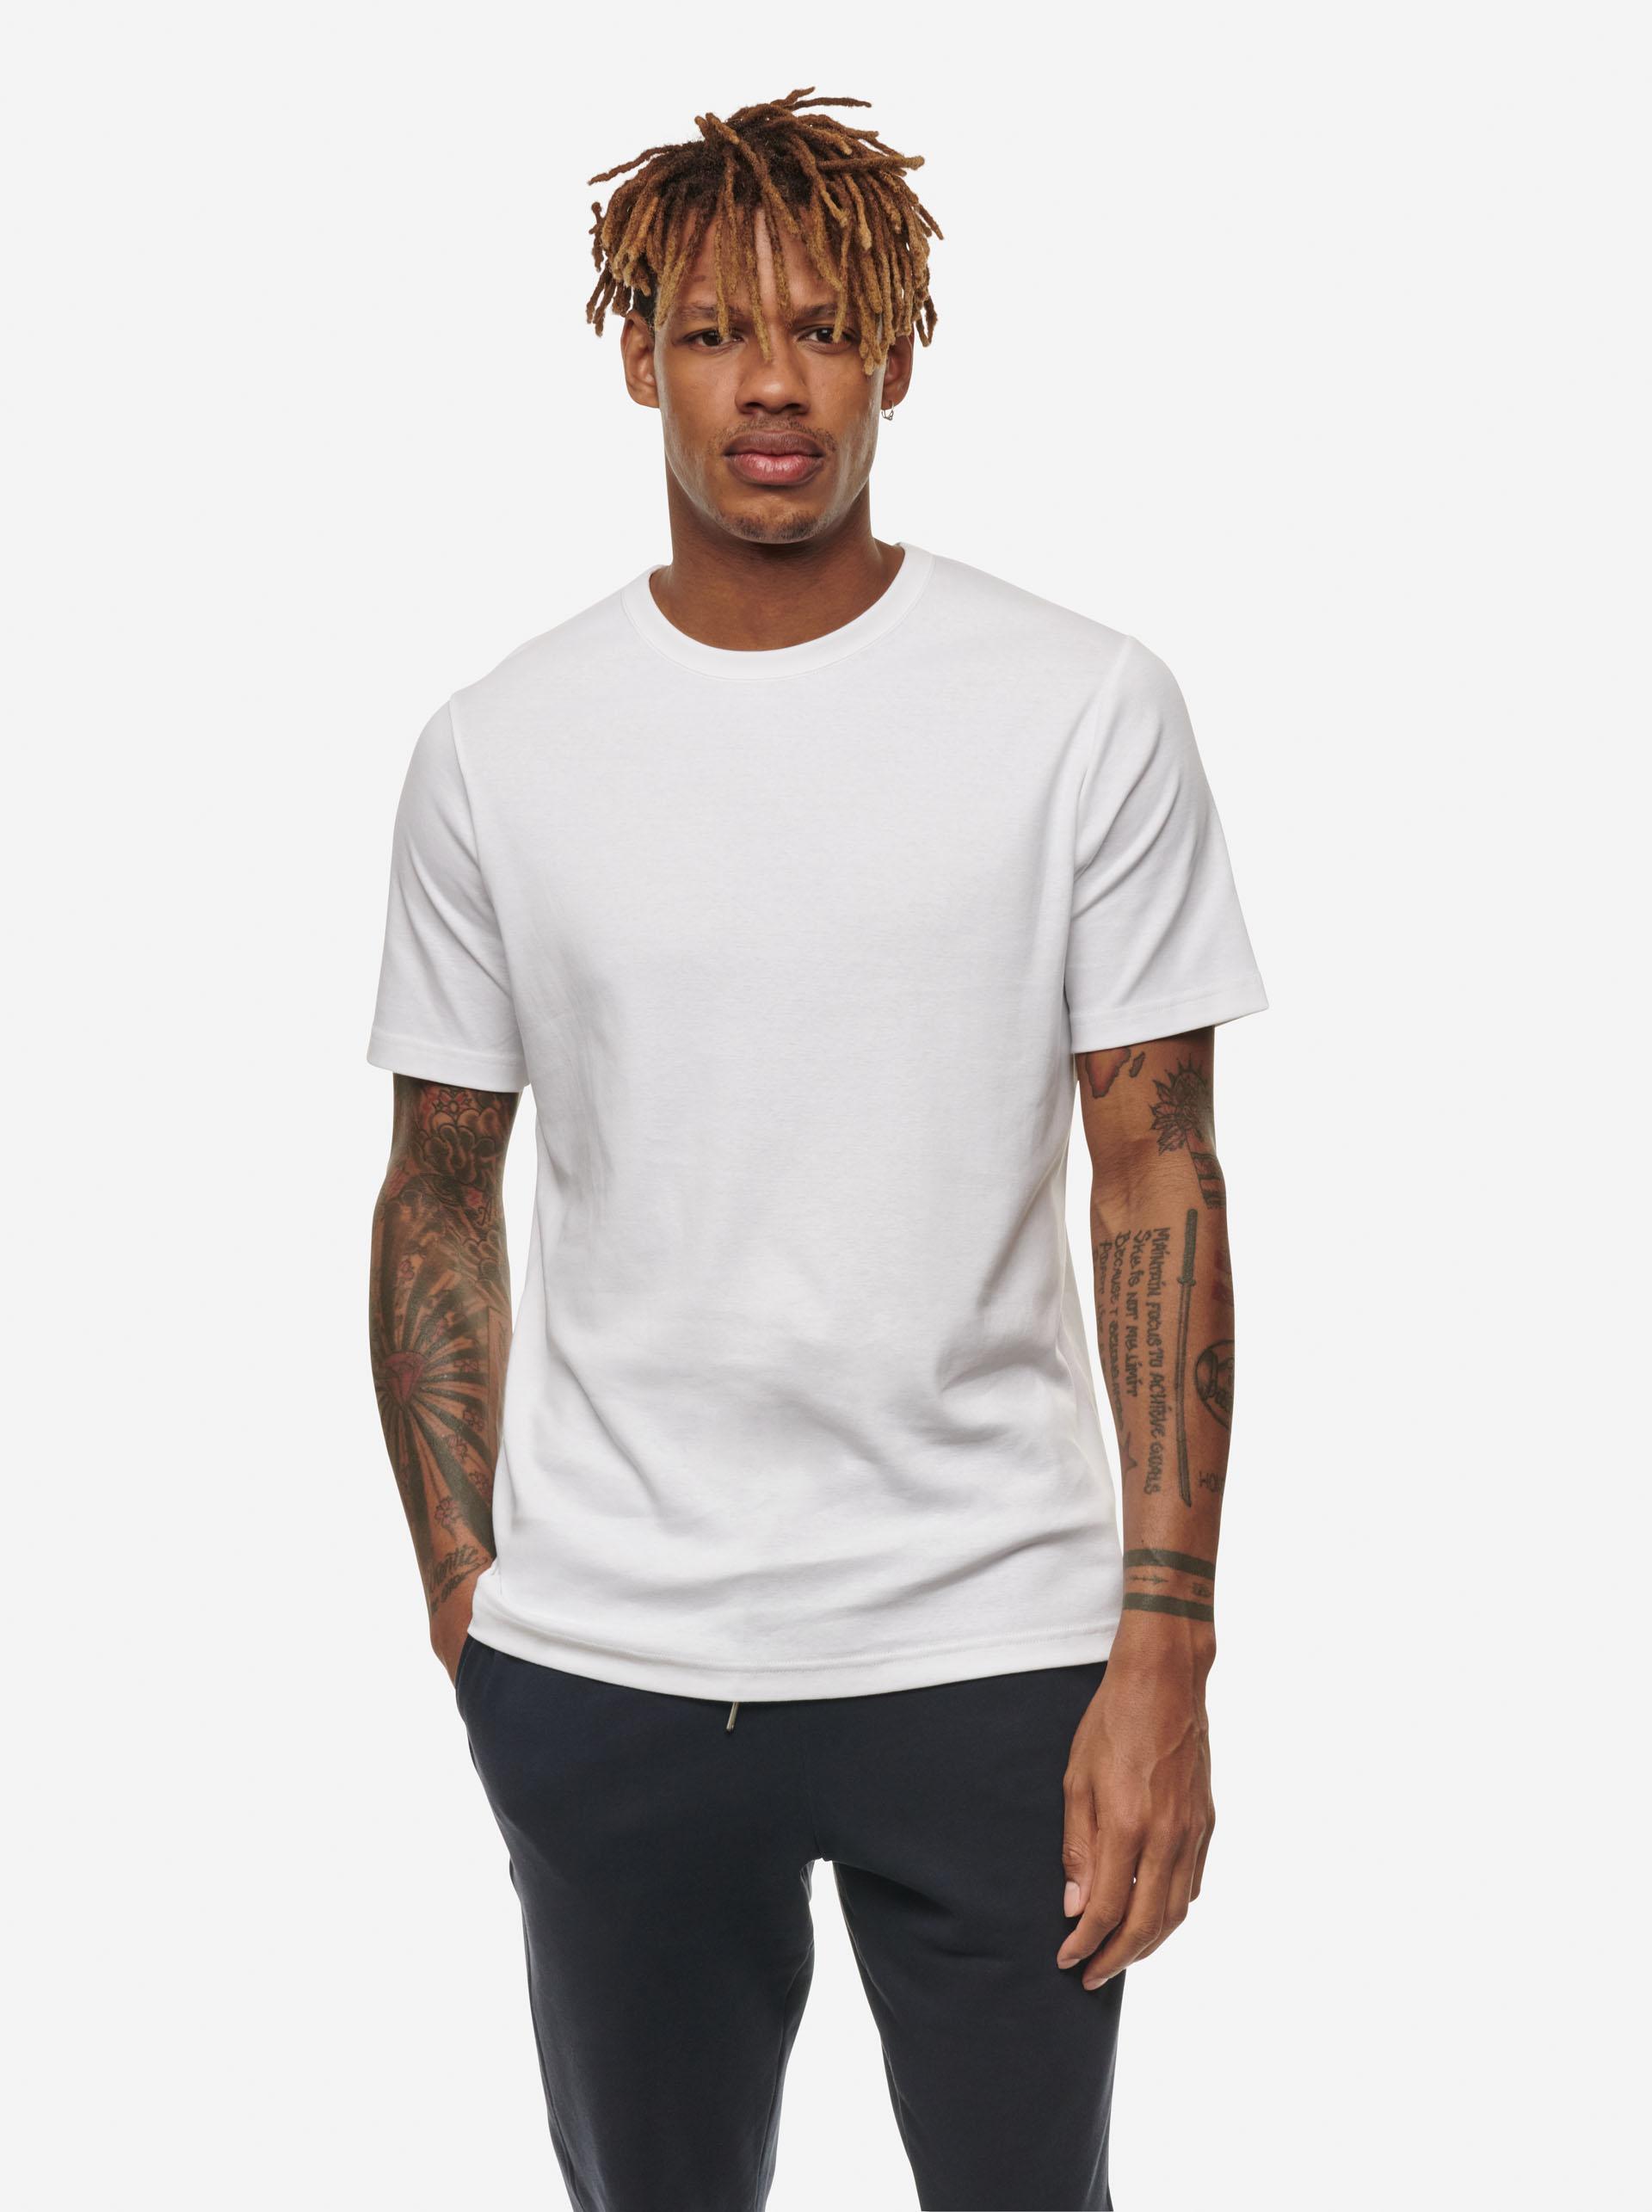 Teym - The-T-Shirt - Men - White - 6